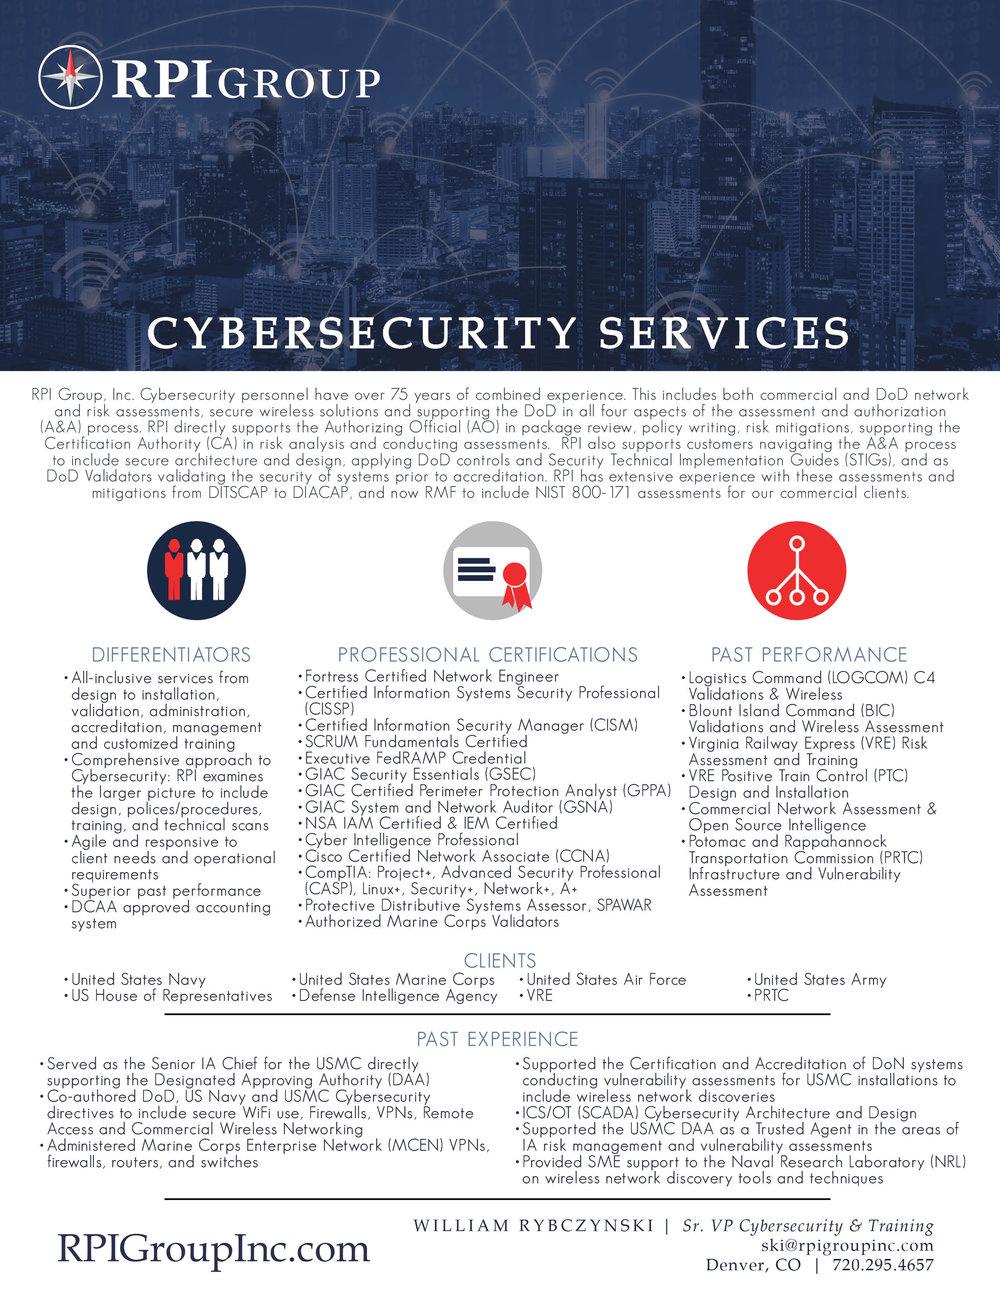 RPI_CorporateCybersecuritySlick_04182.jpg